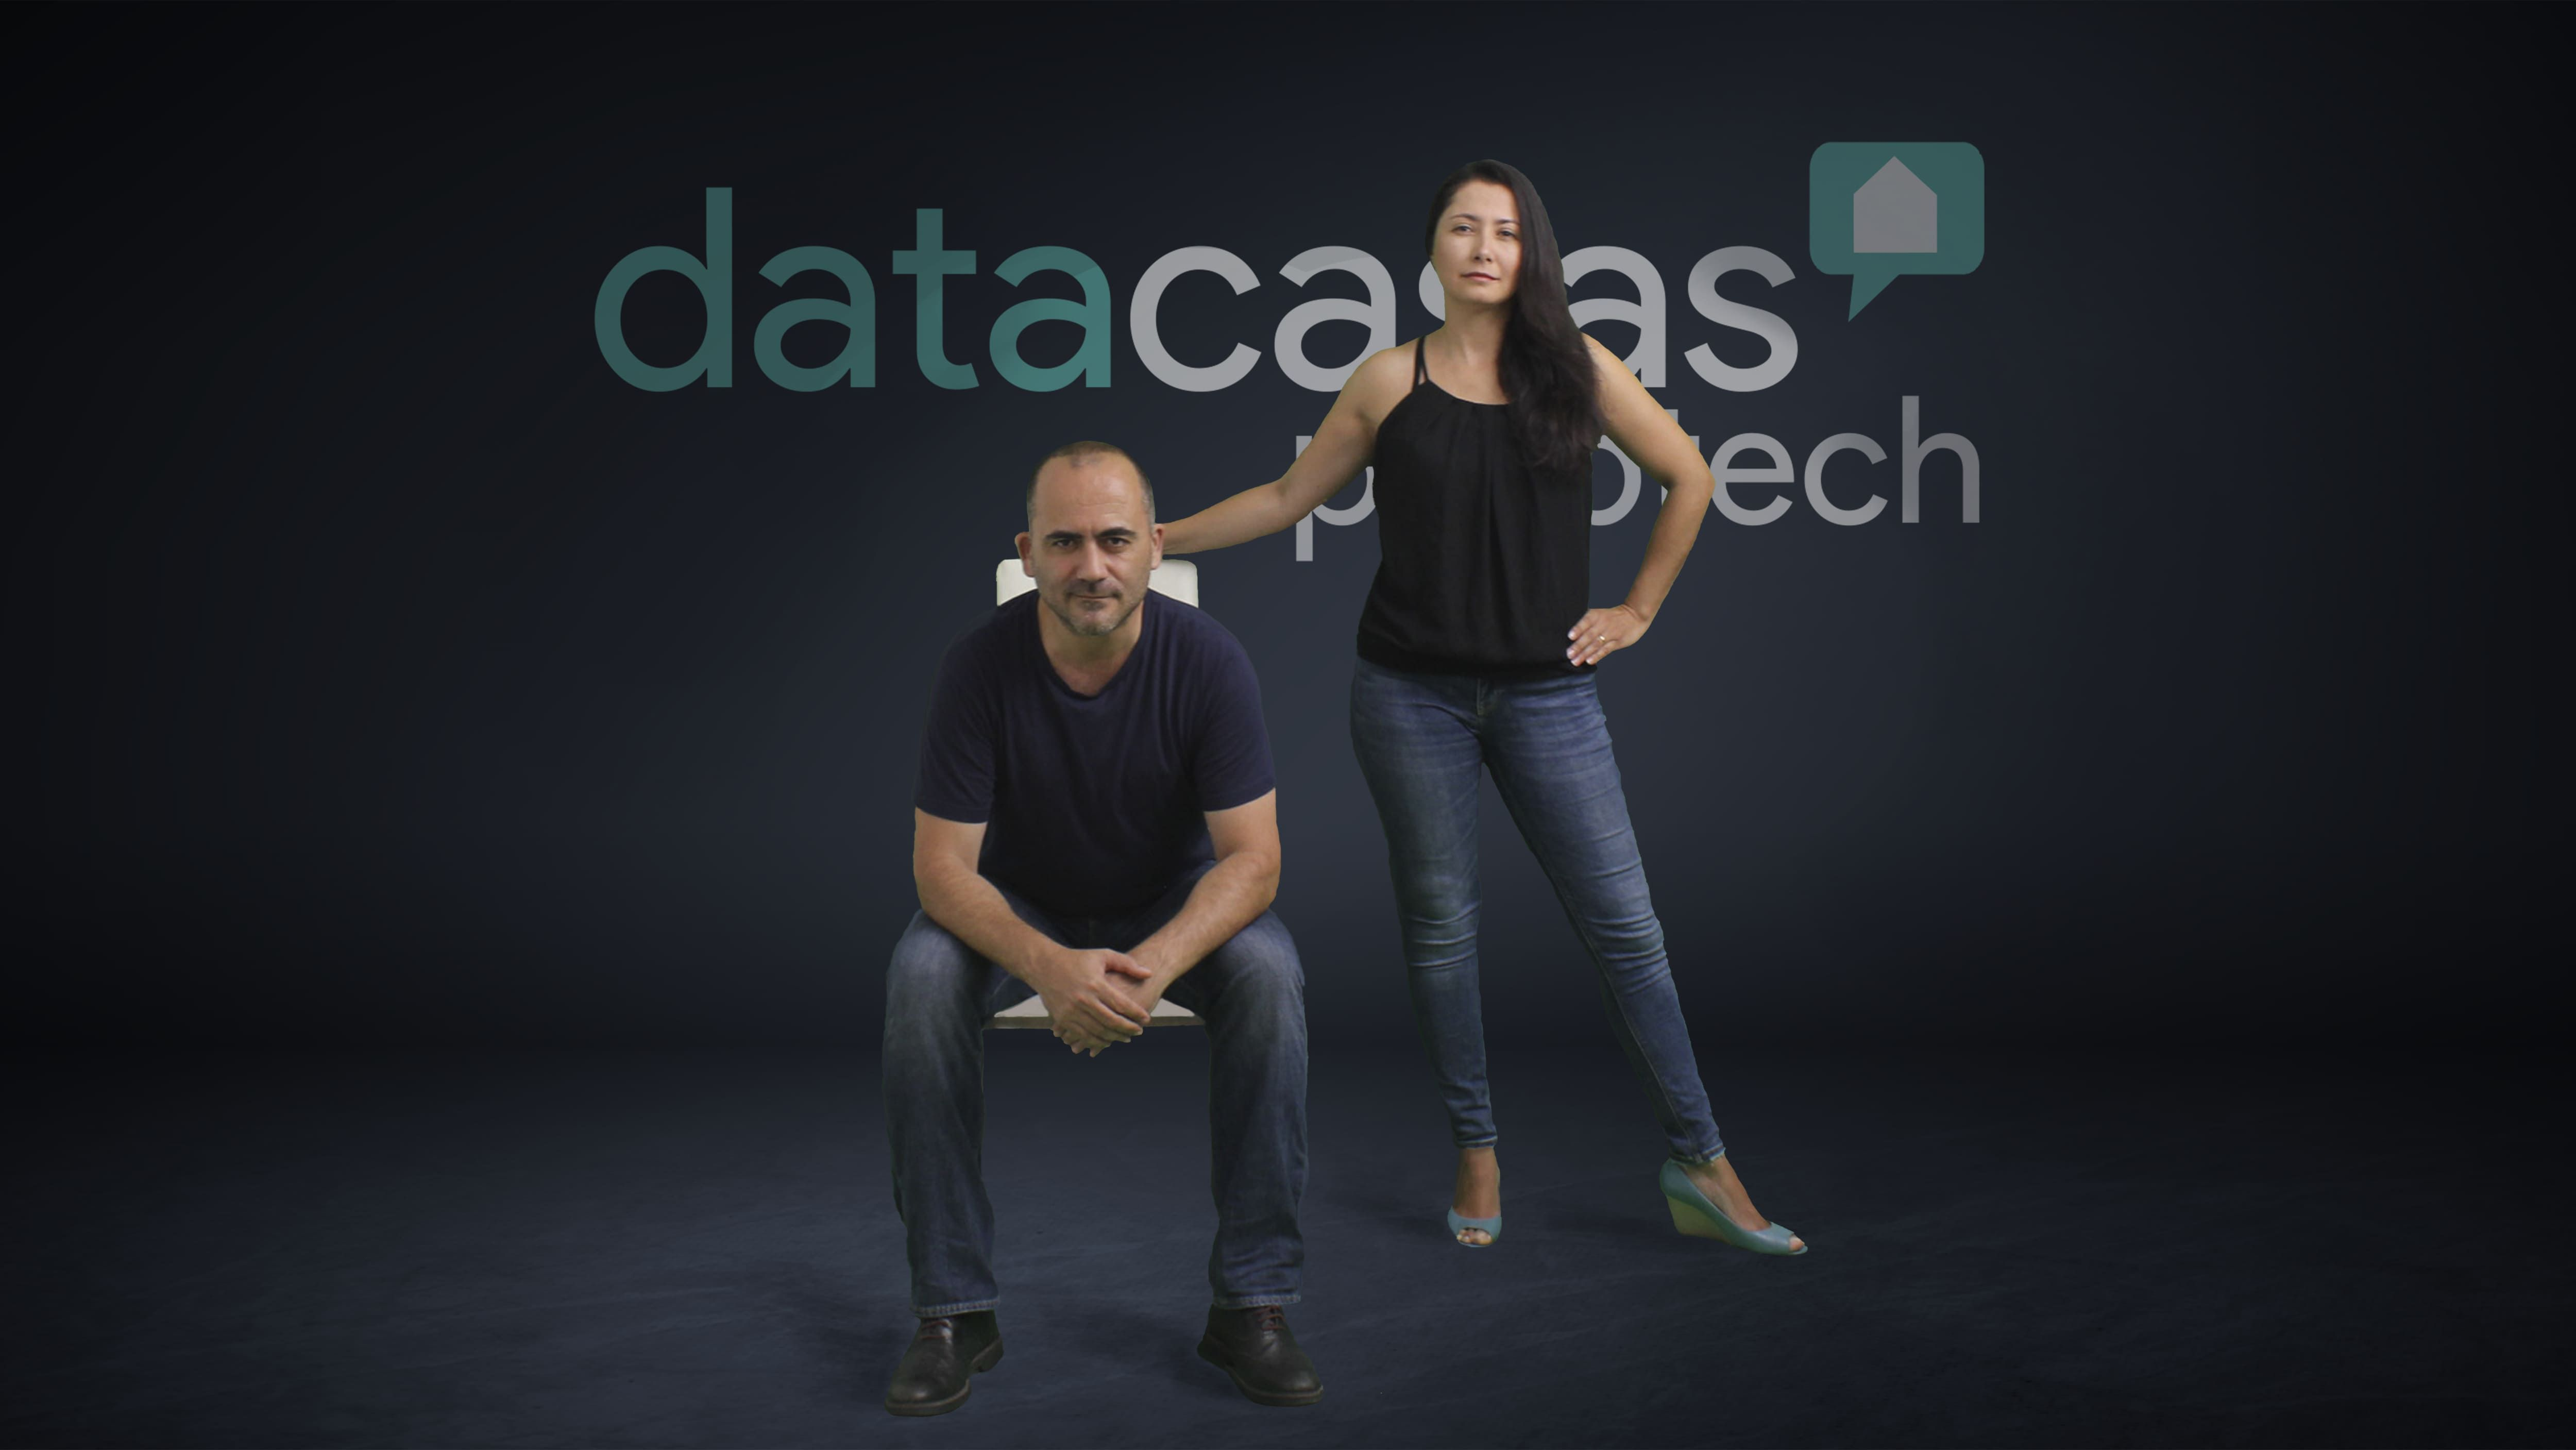 Foto de Datacasas Proptech